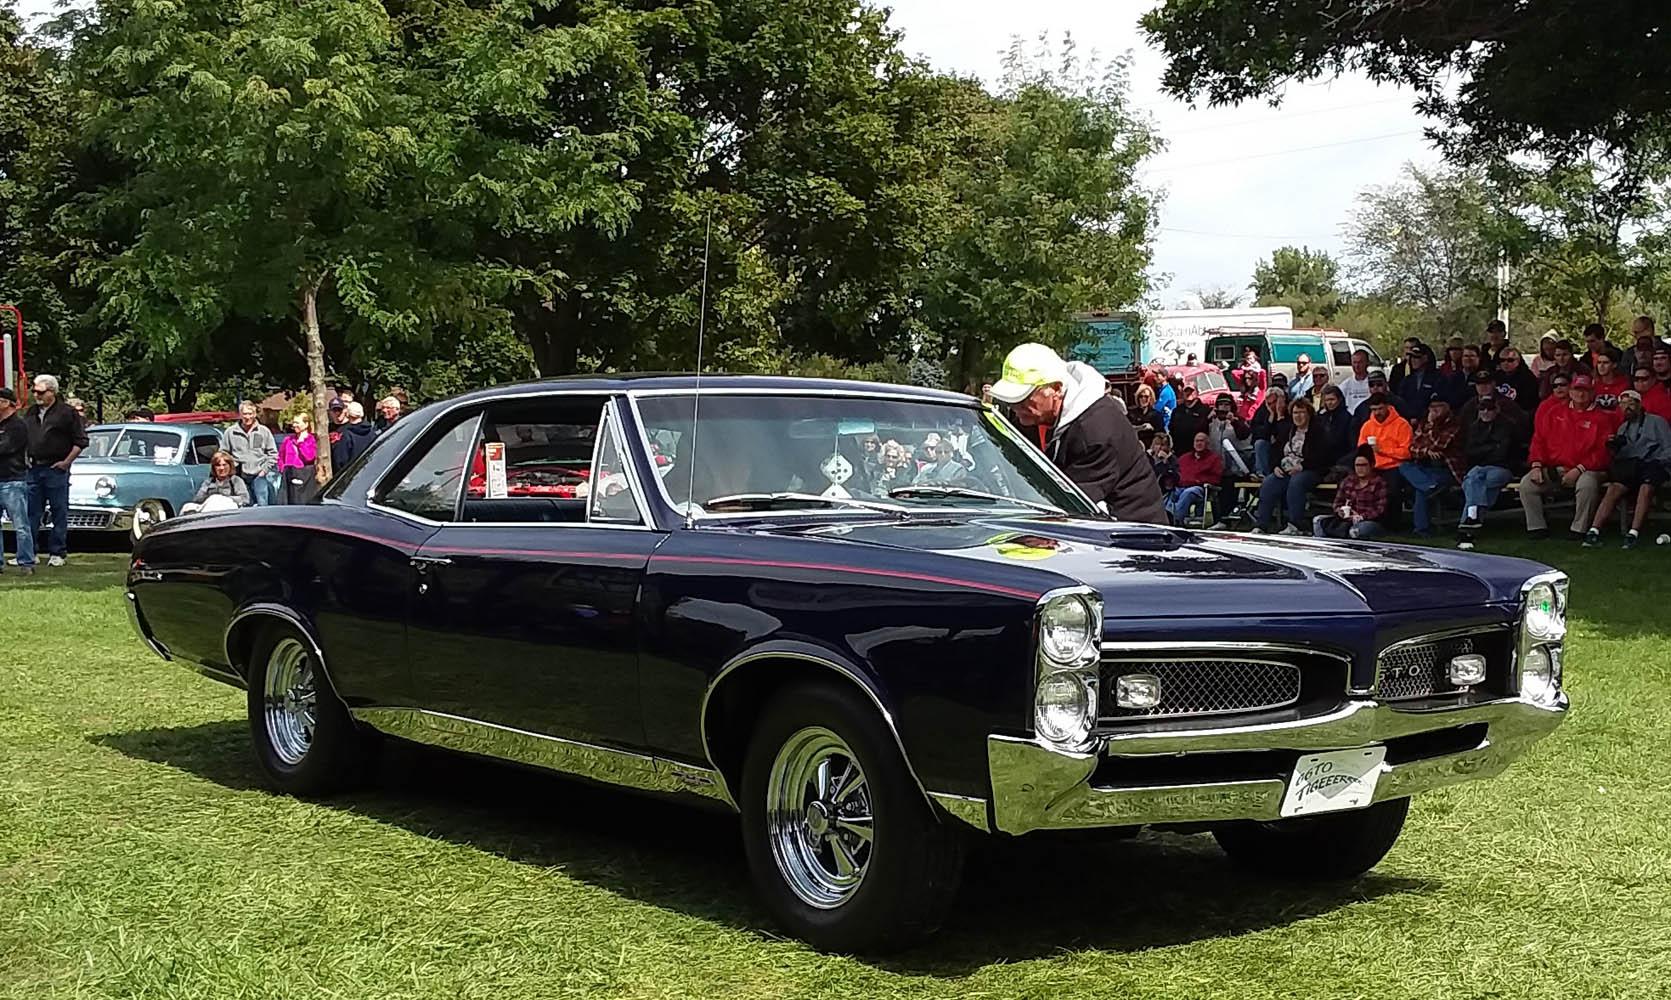 Specialty- 1967 GTO, Barb Statler 1